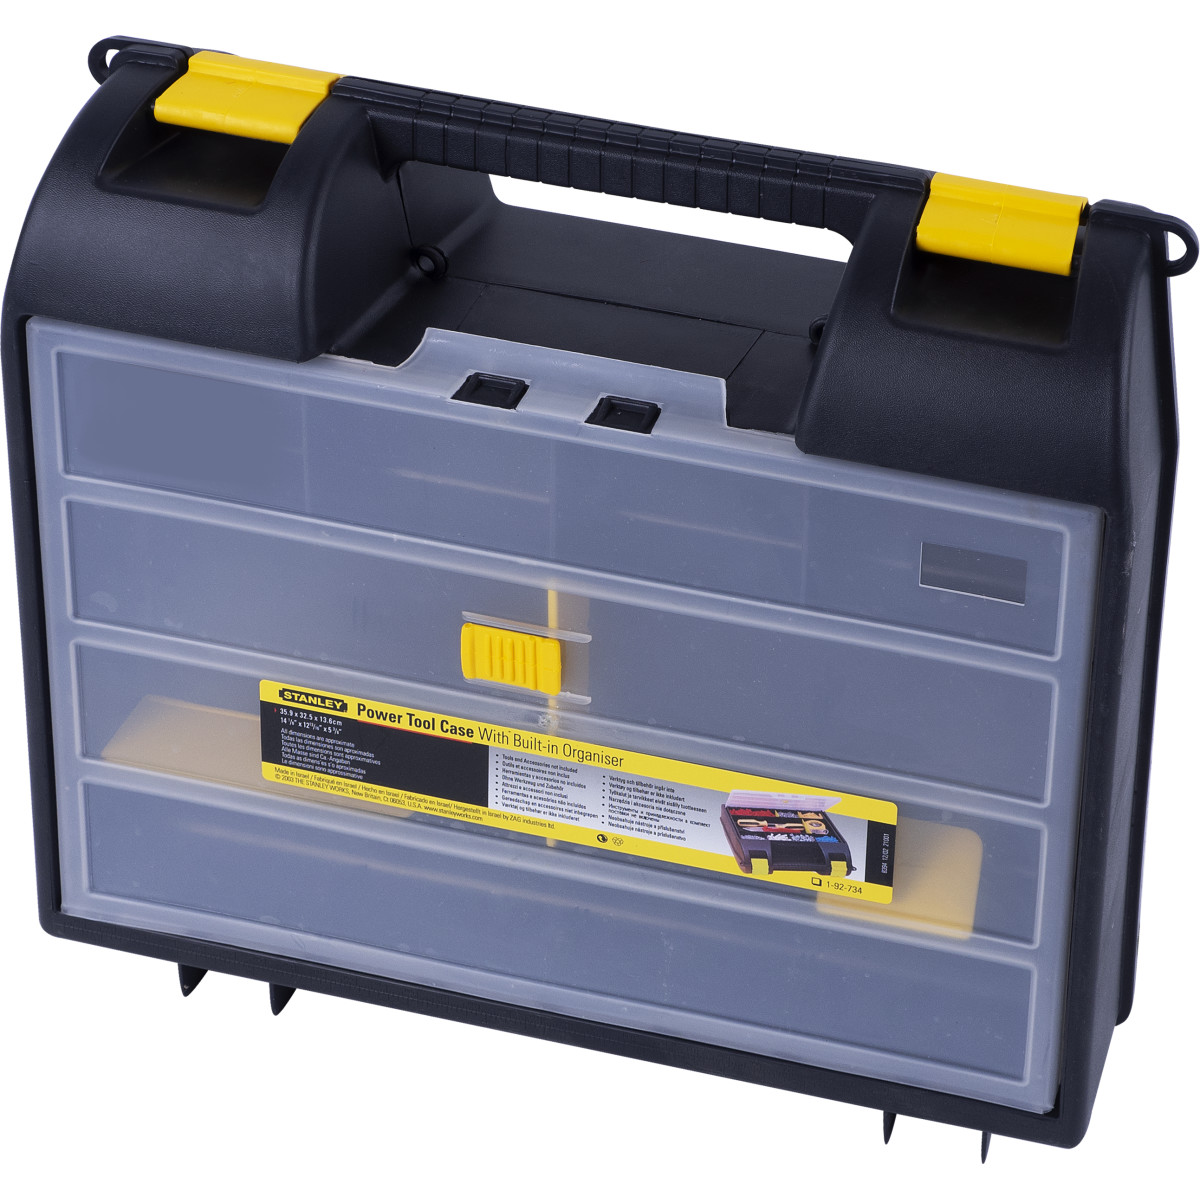 Кейс для электроинструмента Stanley 359х325х136 мм пластик цвет чёрный/жёлтый